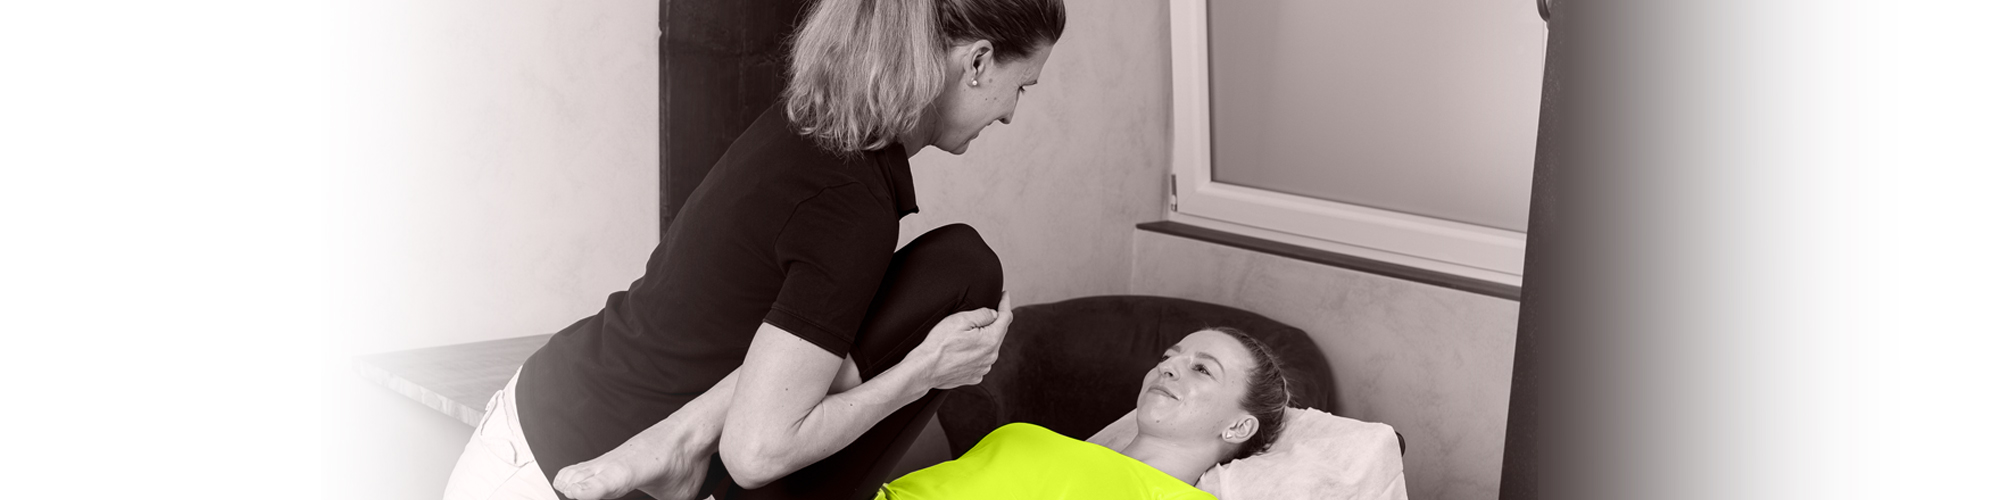 Physiotherapie, Diagnostik und Training